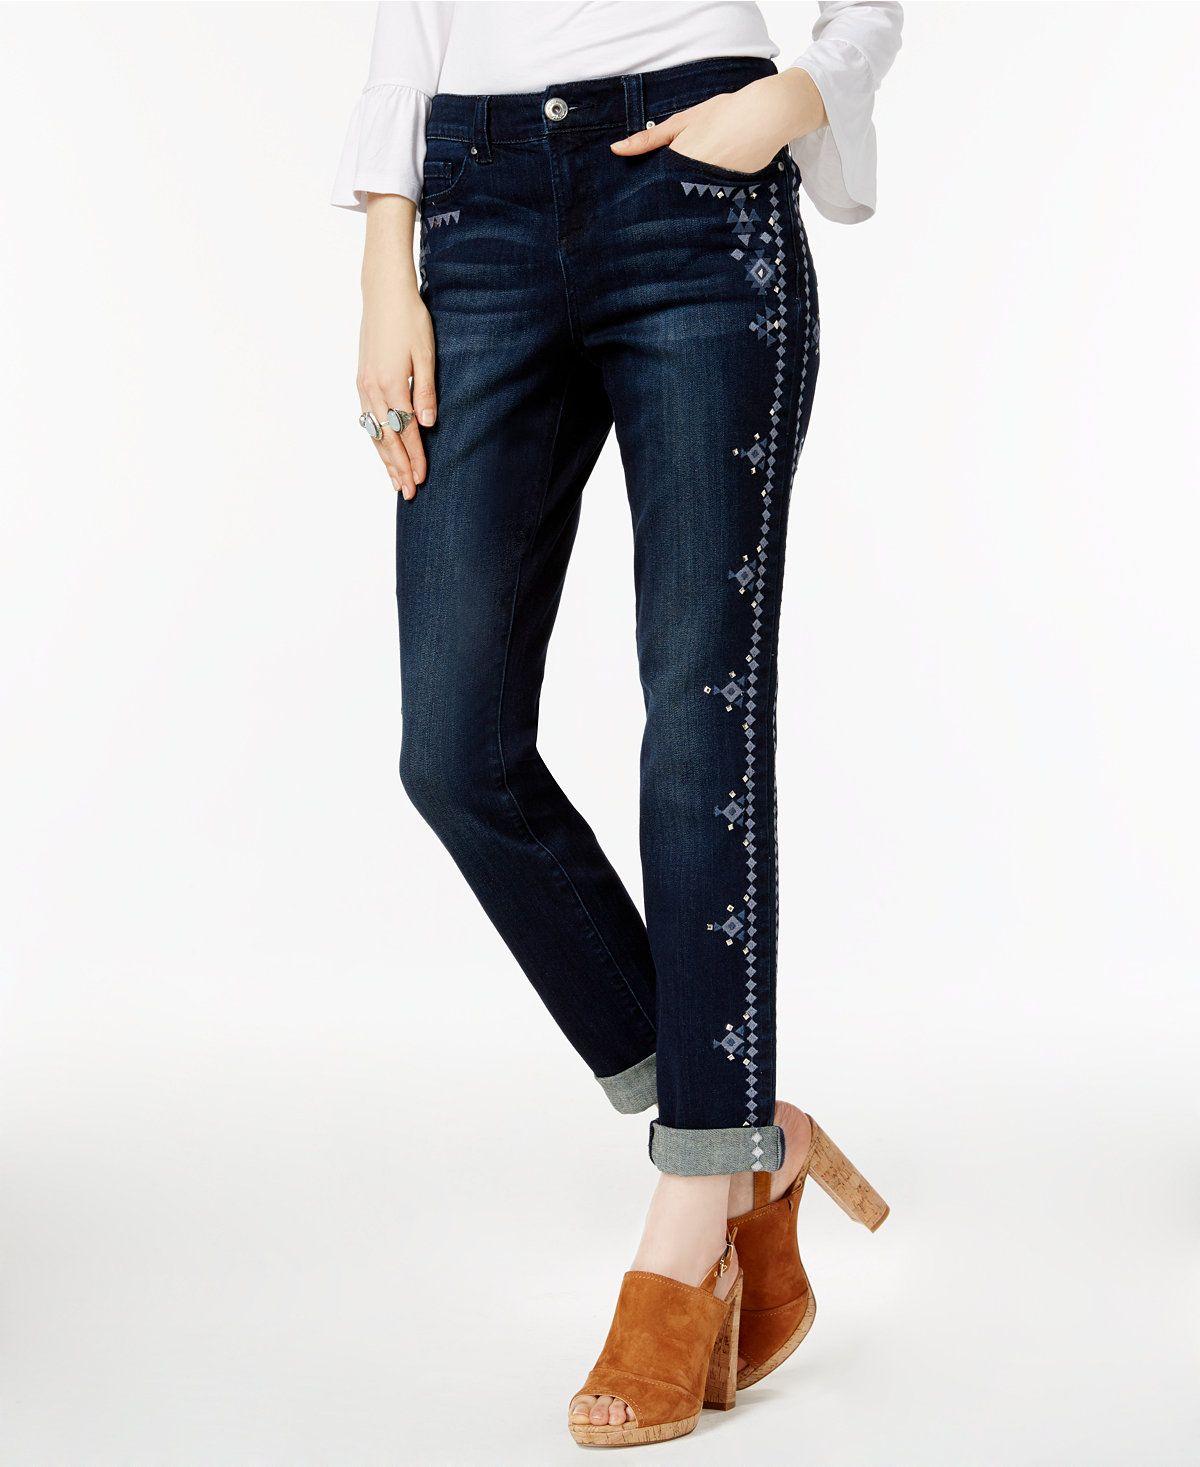 Womens Embroidered Unicorn Wash Boyfriend Jeans